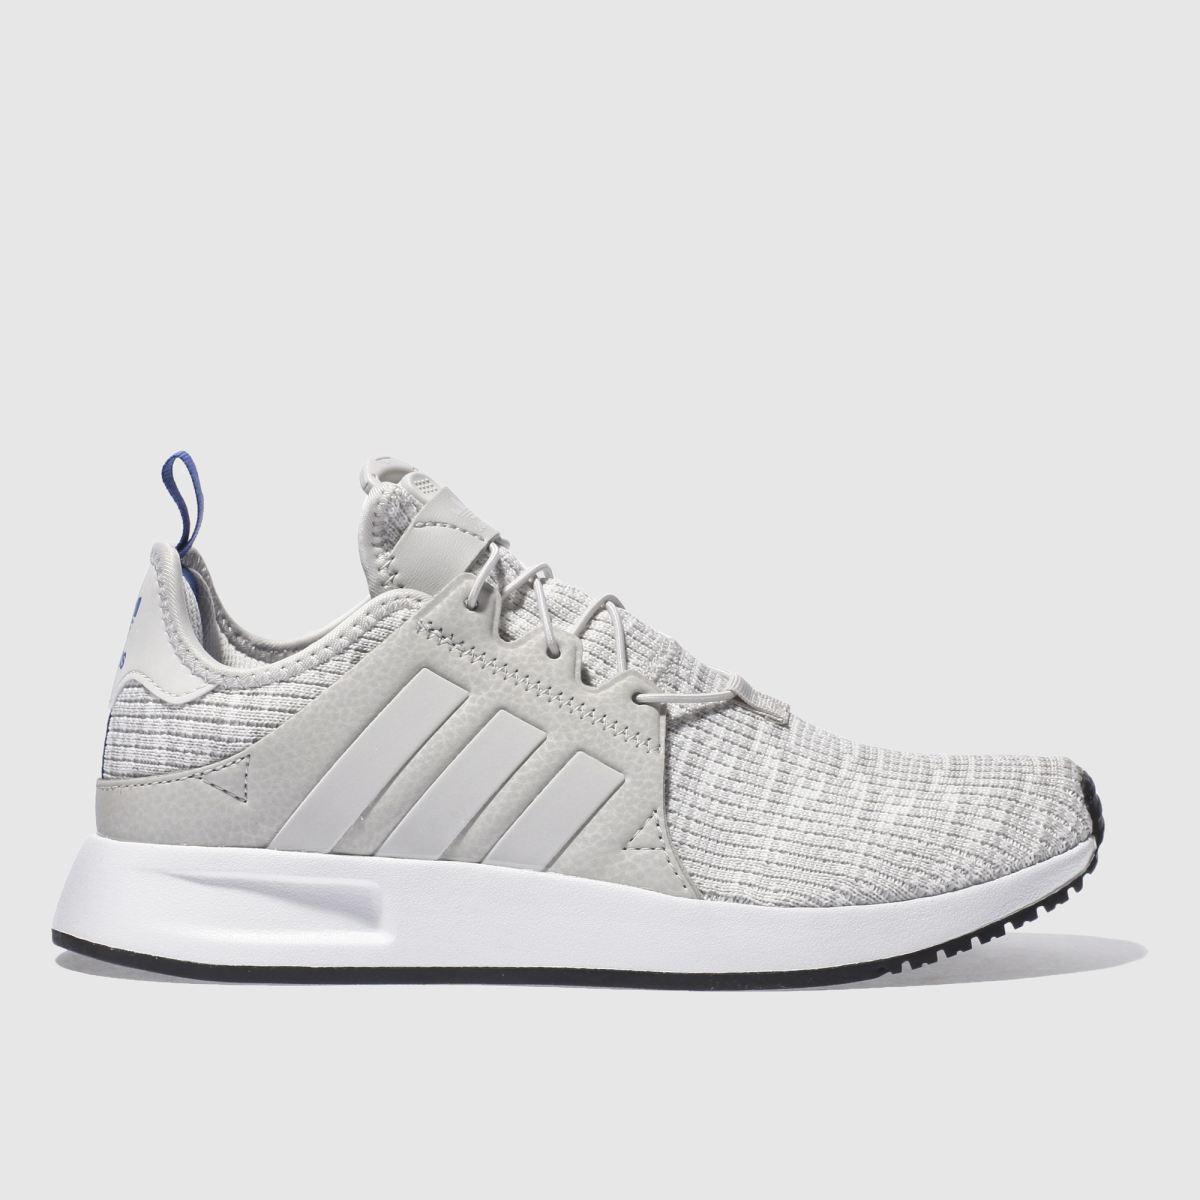 adidas light grey adi x plr trainers